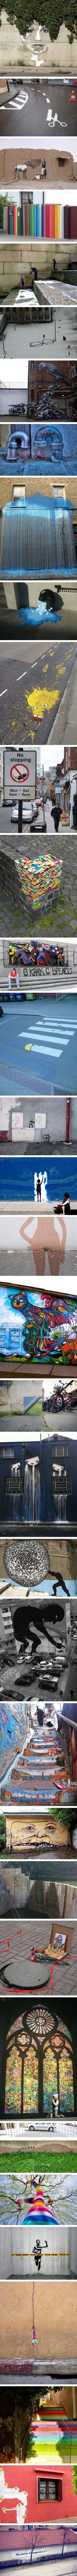 hermoso arte callejero